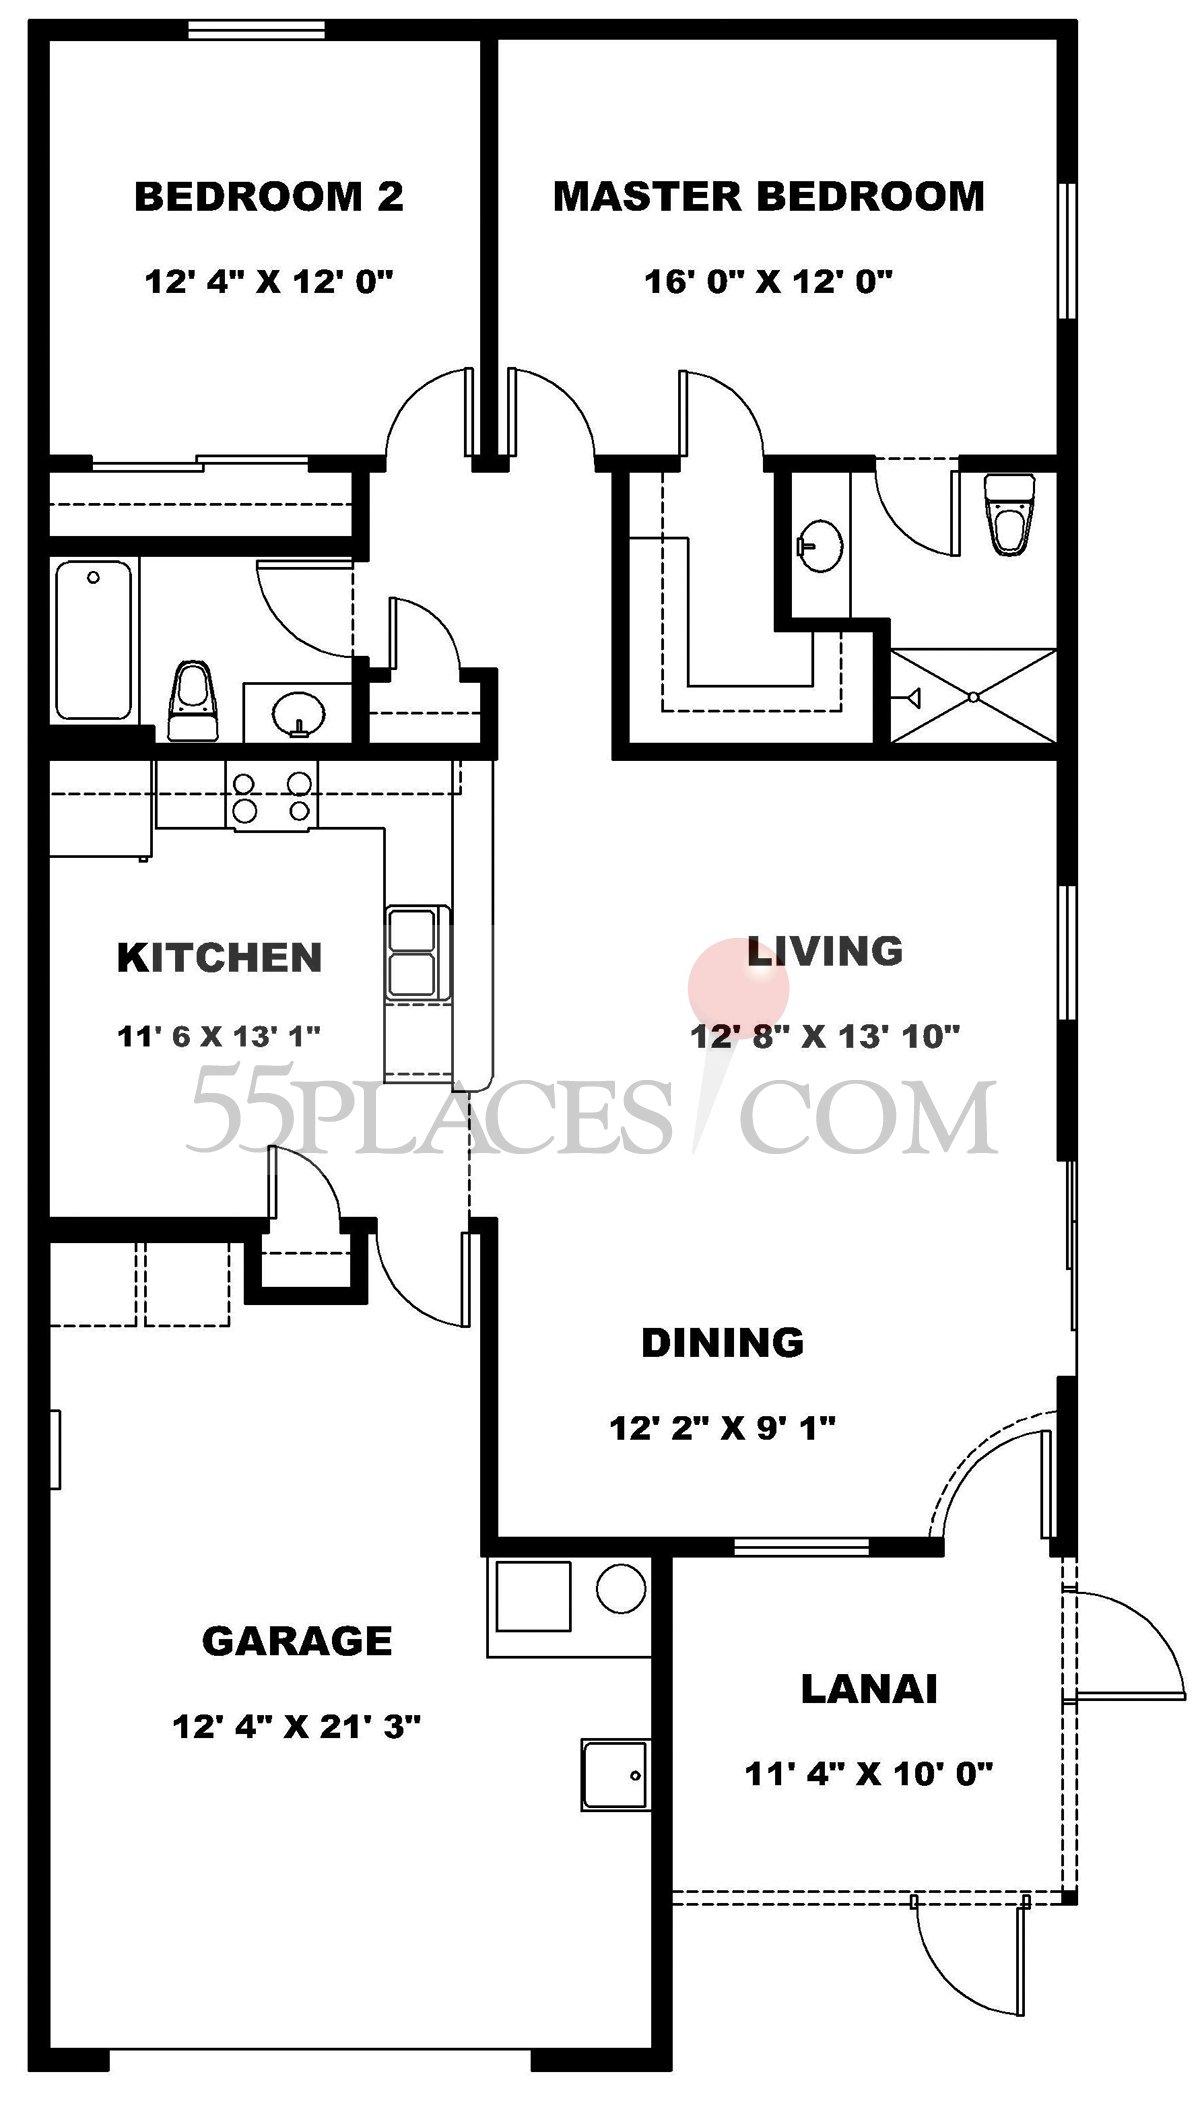 colony villa floorplan 1163 sq ft the villages 55places